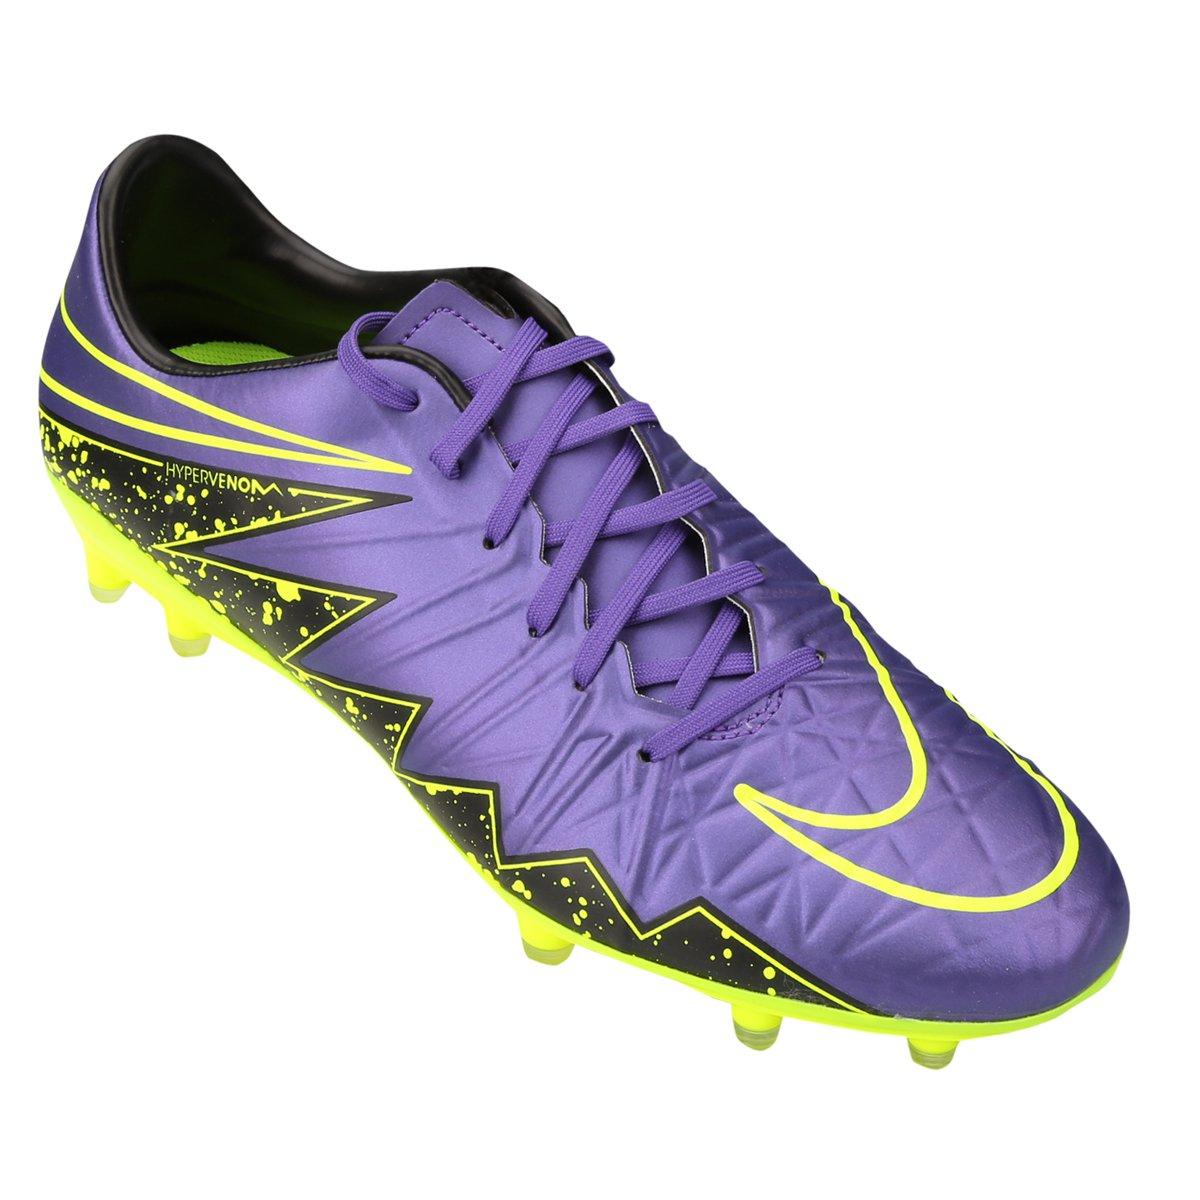 Chuteira Nike Hypervenom Phatal 2 FG - Compre Agora  2eada2908e99a